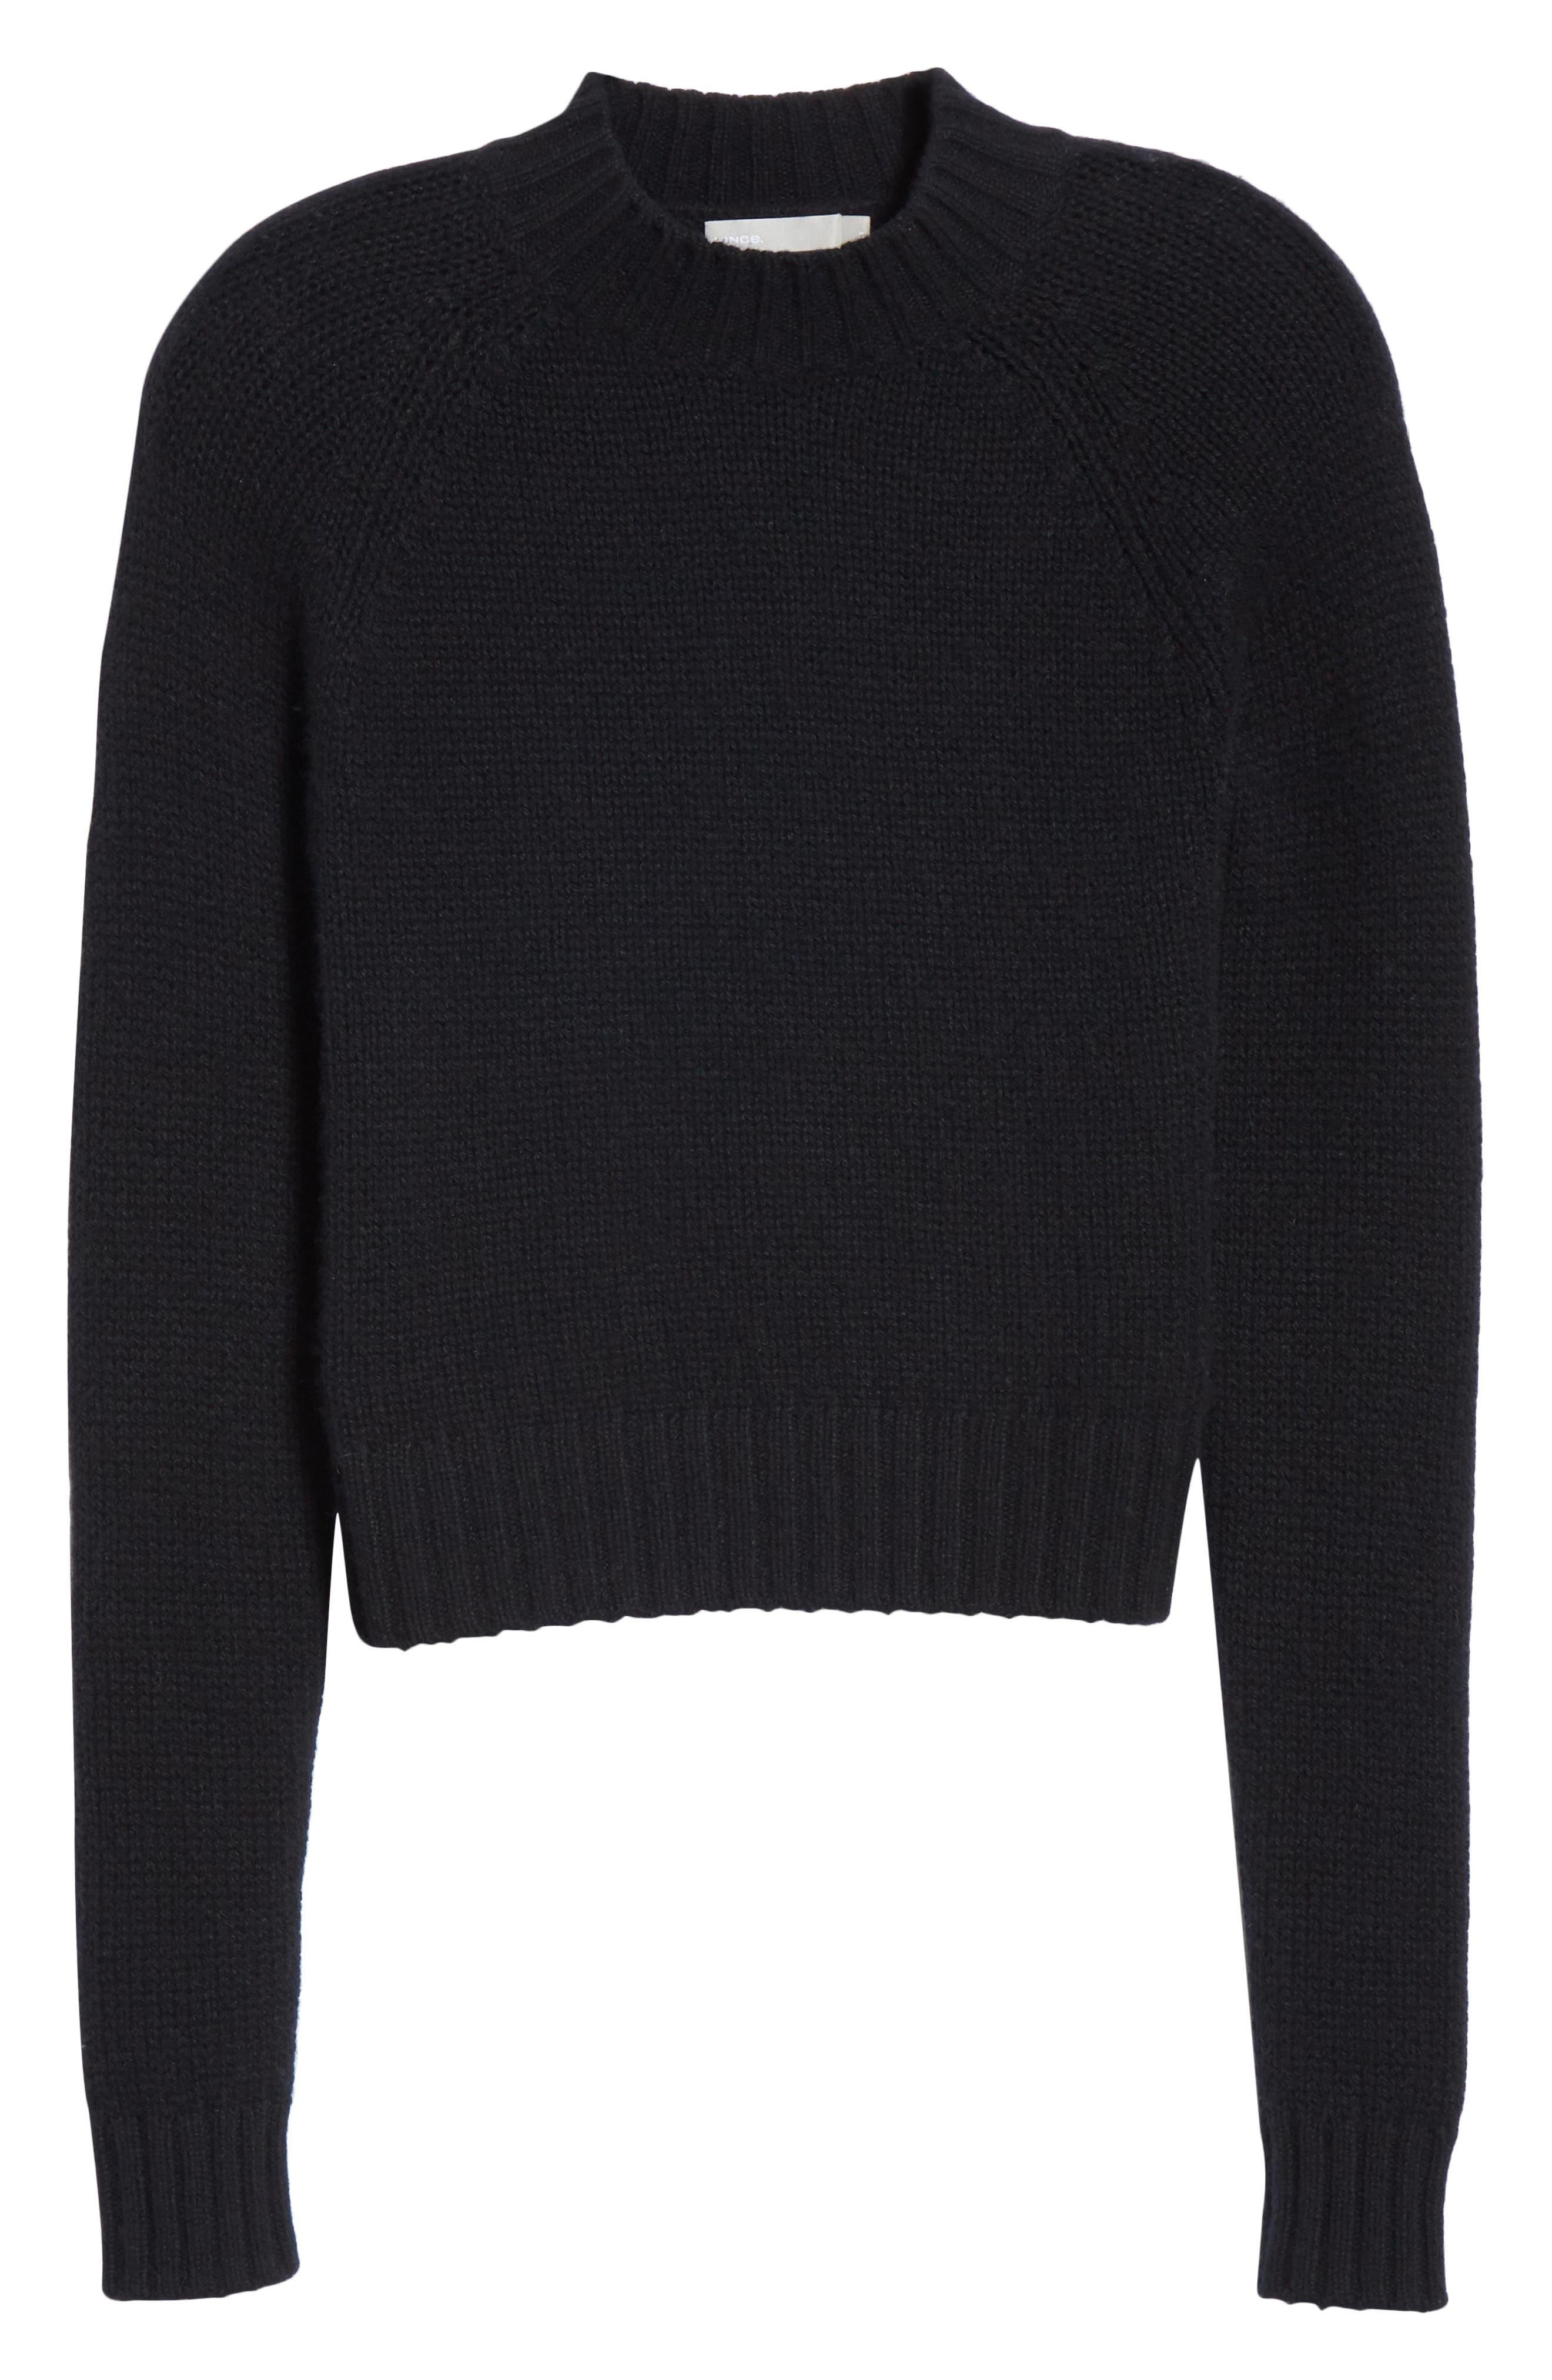 Shrunken Cashmere Sweater,                             Alternate thumbnail 6, color,                             BLACK